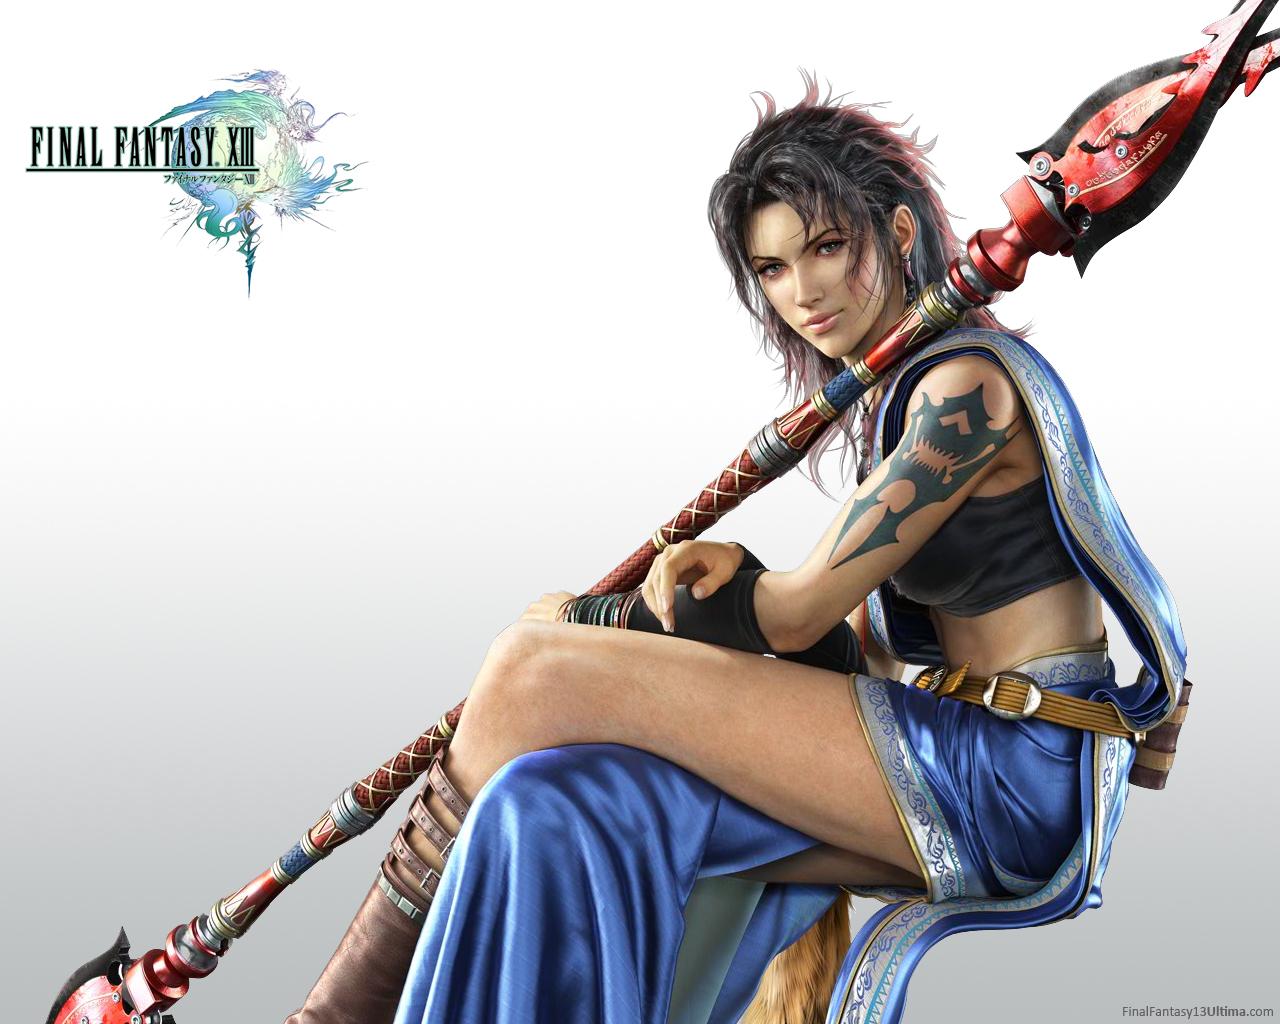 Animaatjes Final Fantasy 13 48989 Wallpaper